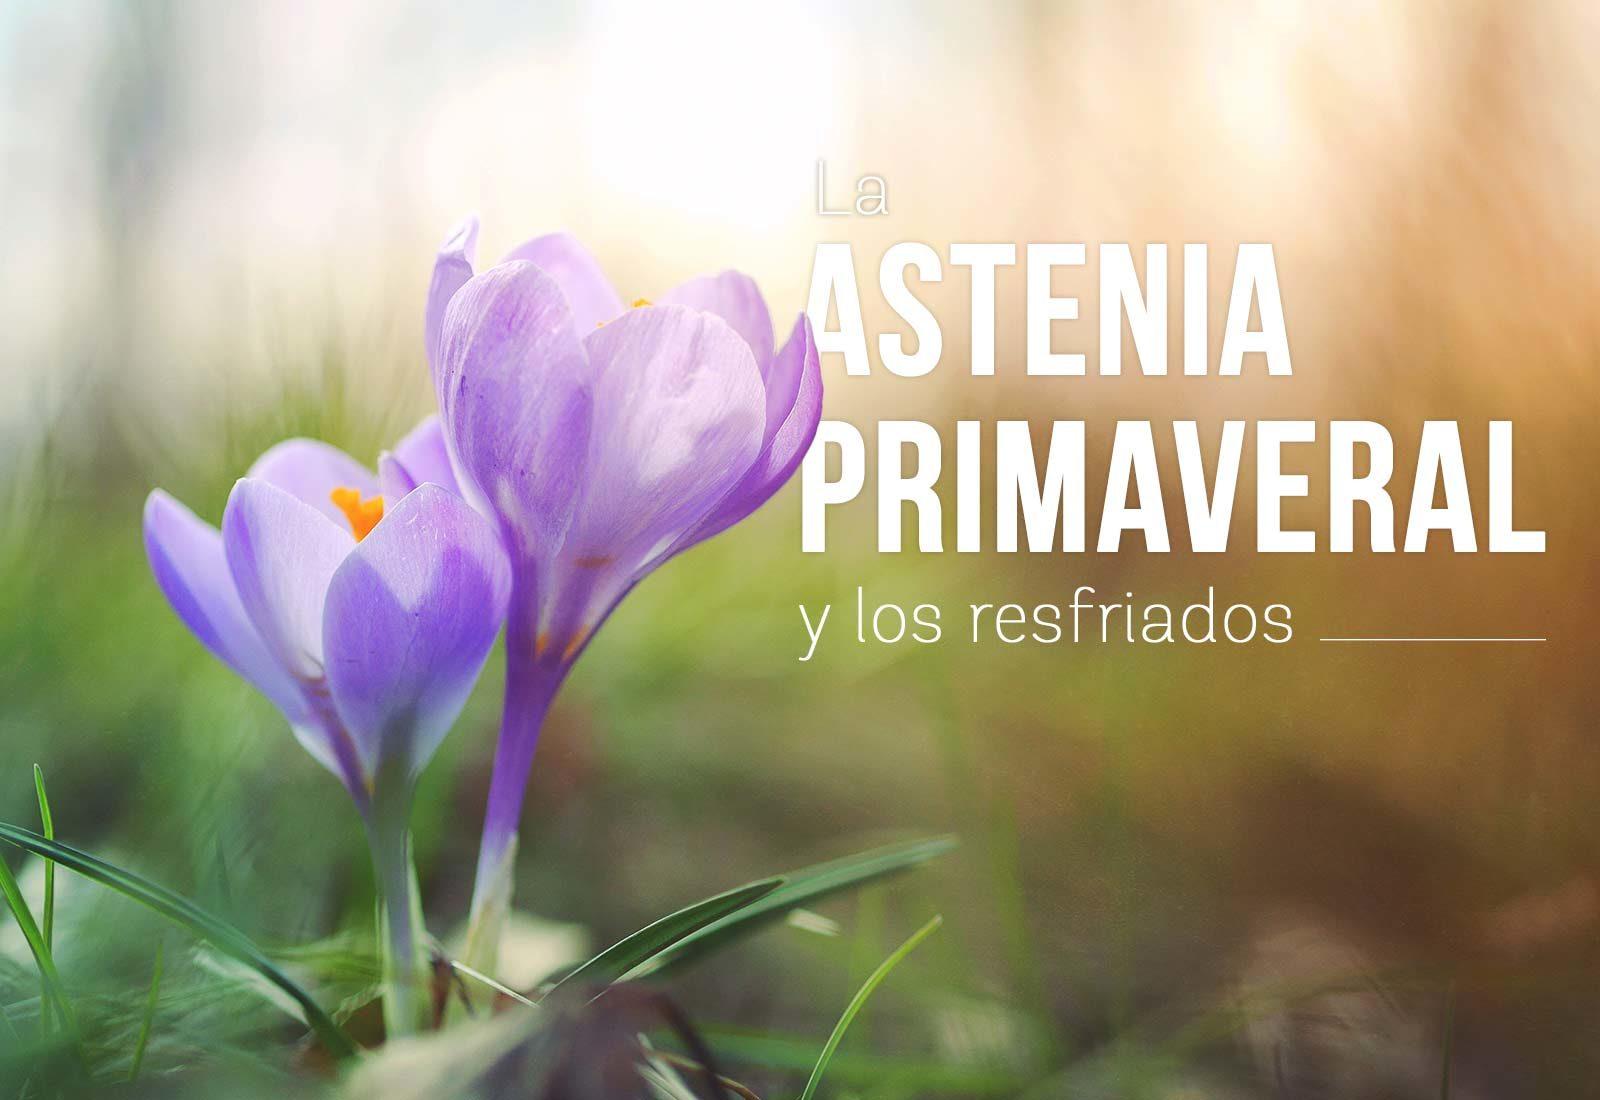 astenia primaveral